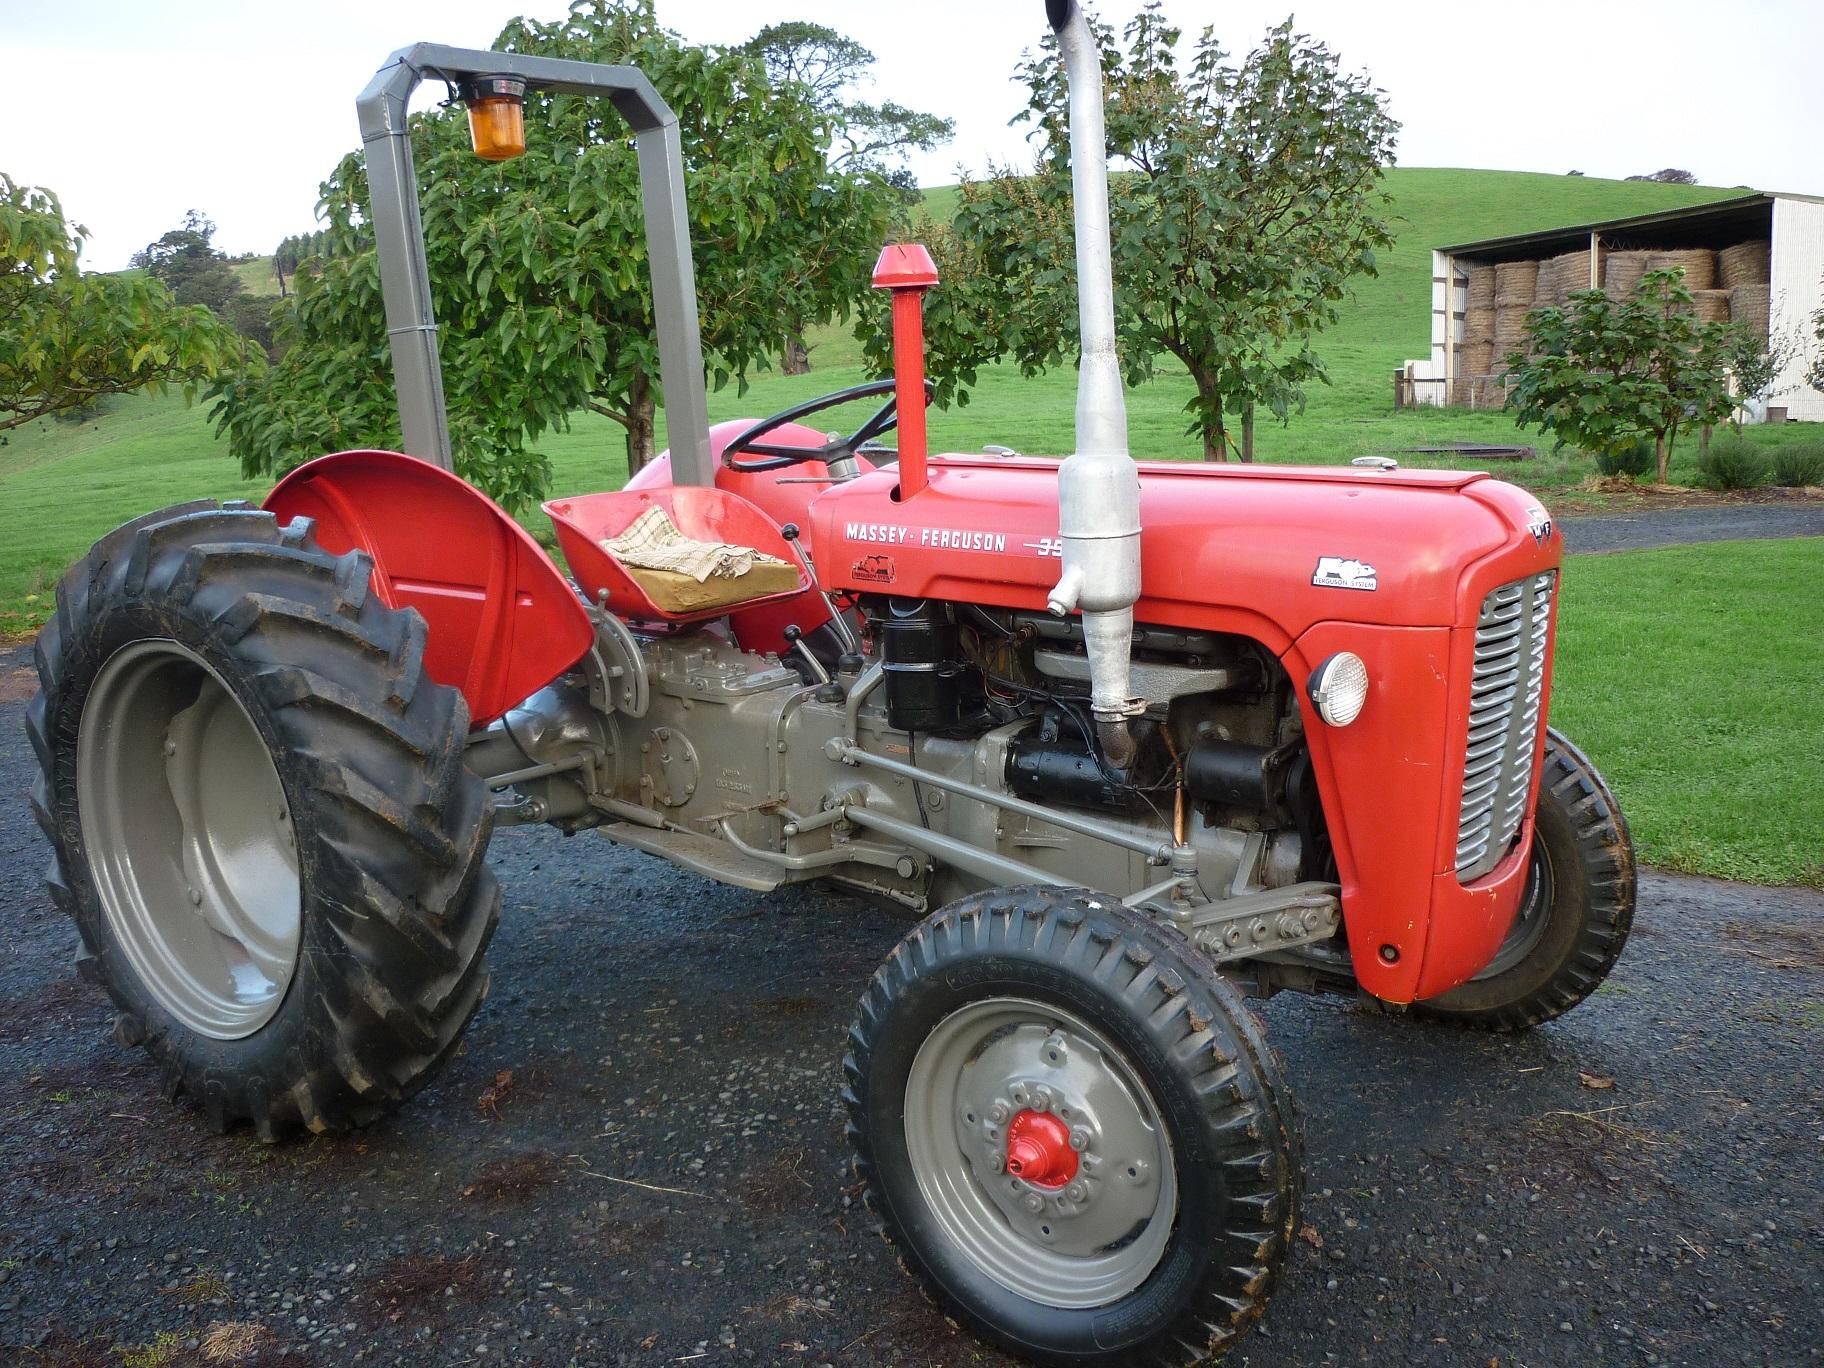 massey ferguson 35 4 tractor machinery equipment tractors. Black Bedroom Furniture Sets. Home Design Ideas